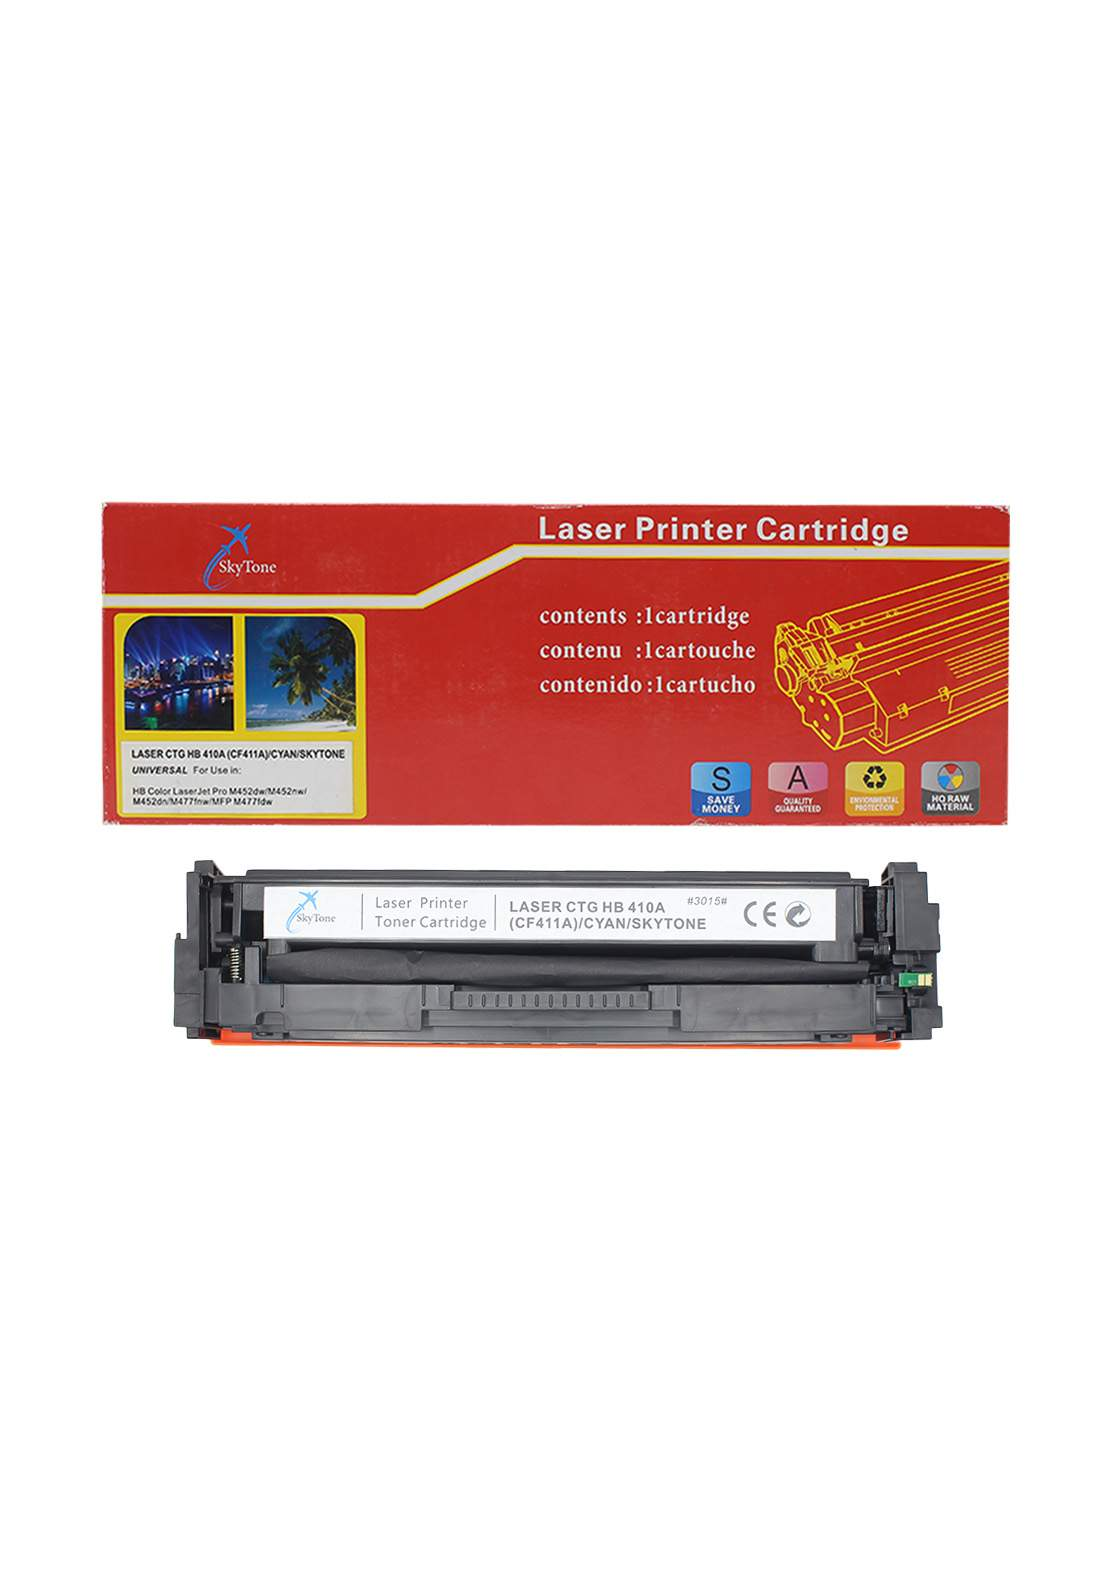 SKYTONE CTG HP 410A (CF411A) Laser Printer Toner Cartridge خرطوشة حبر